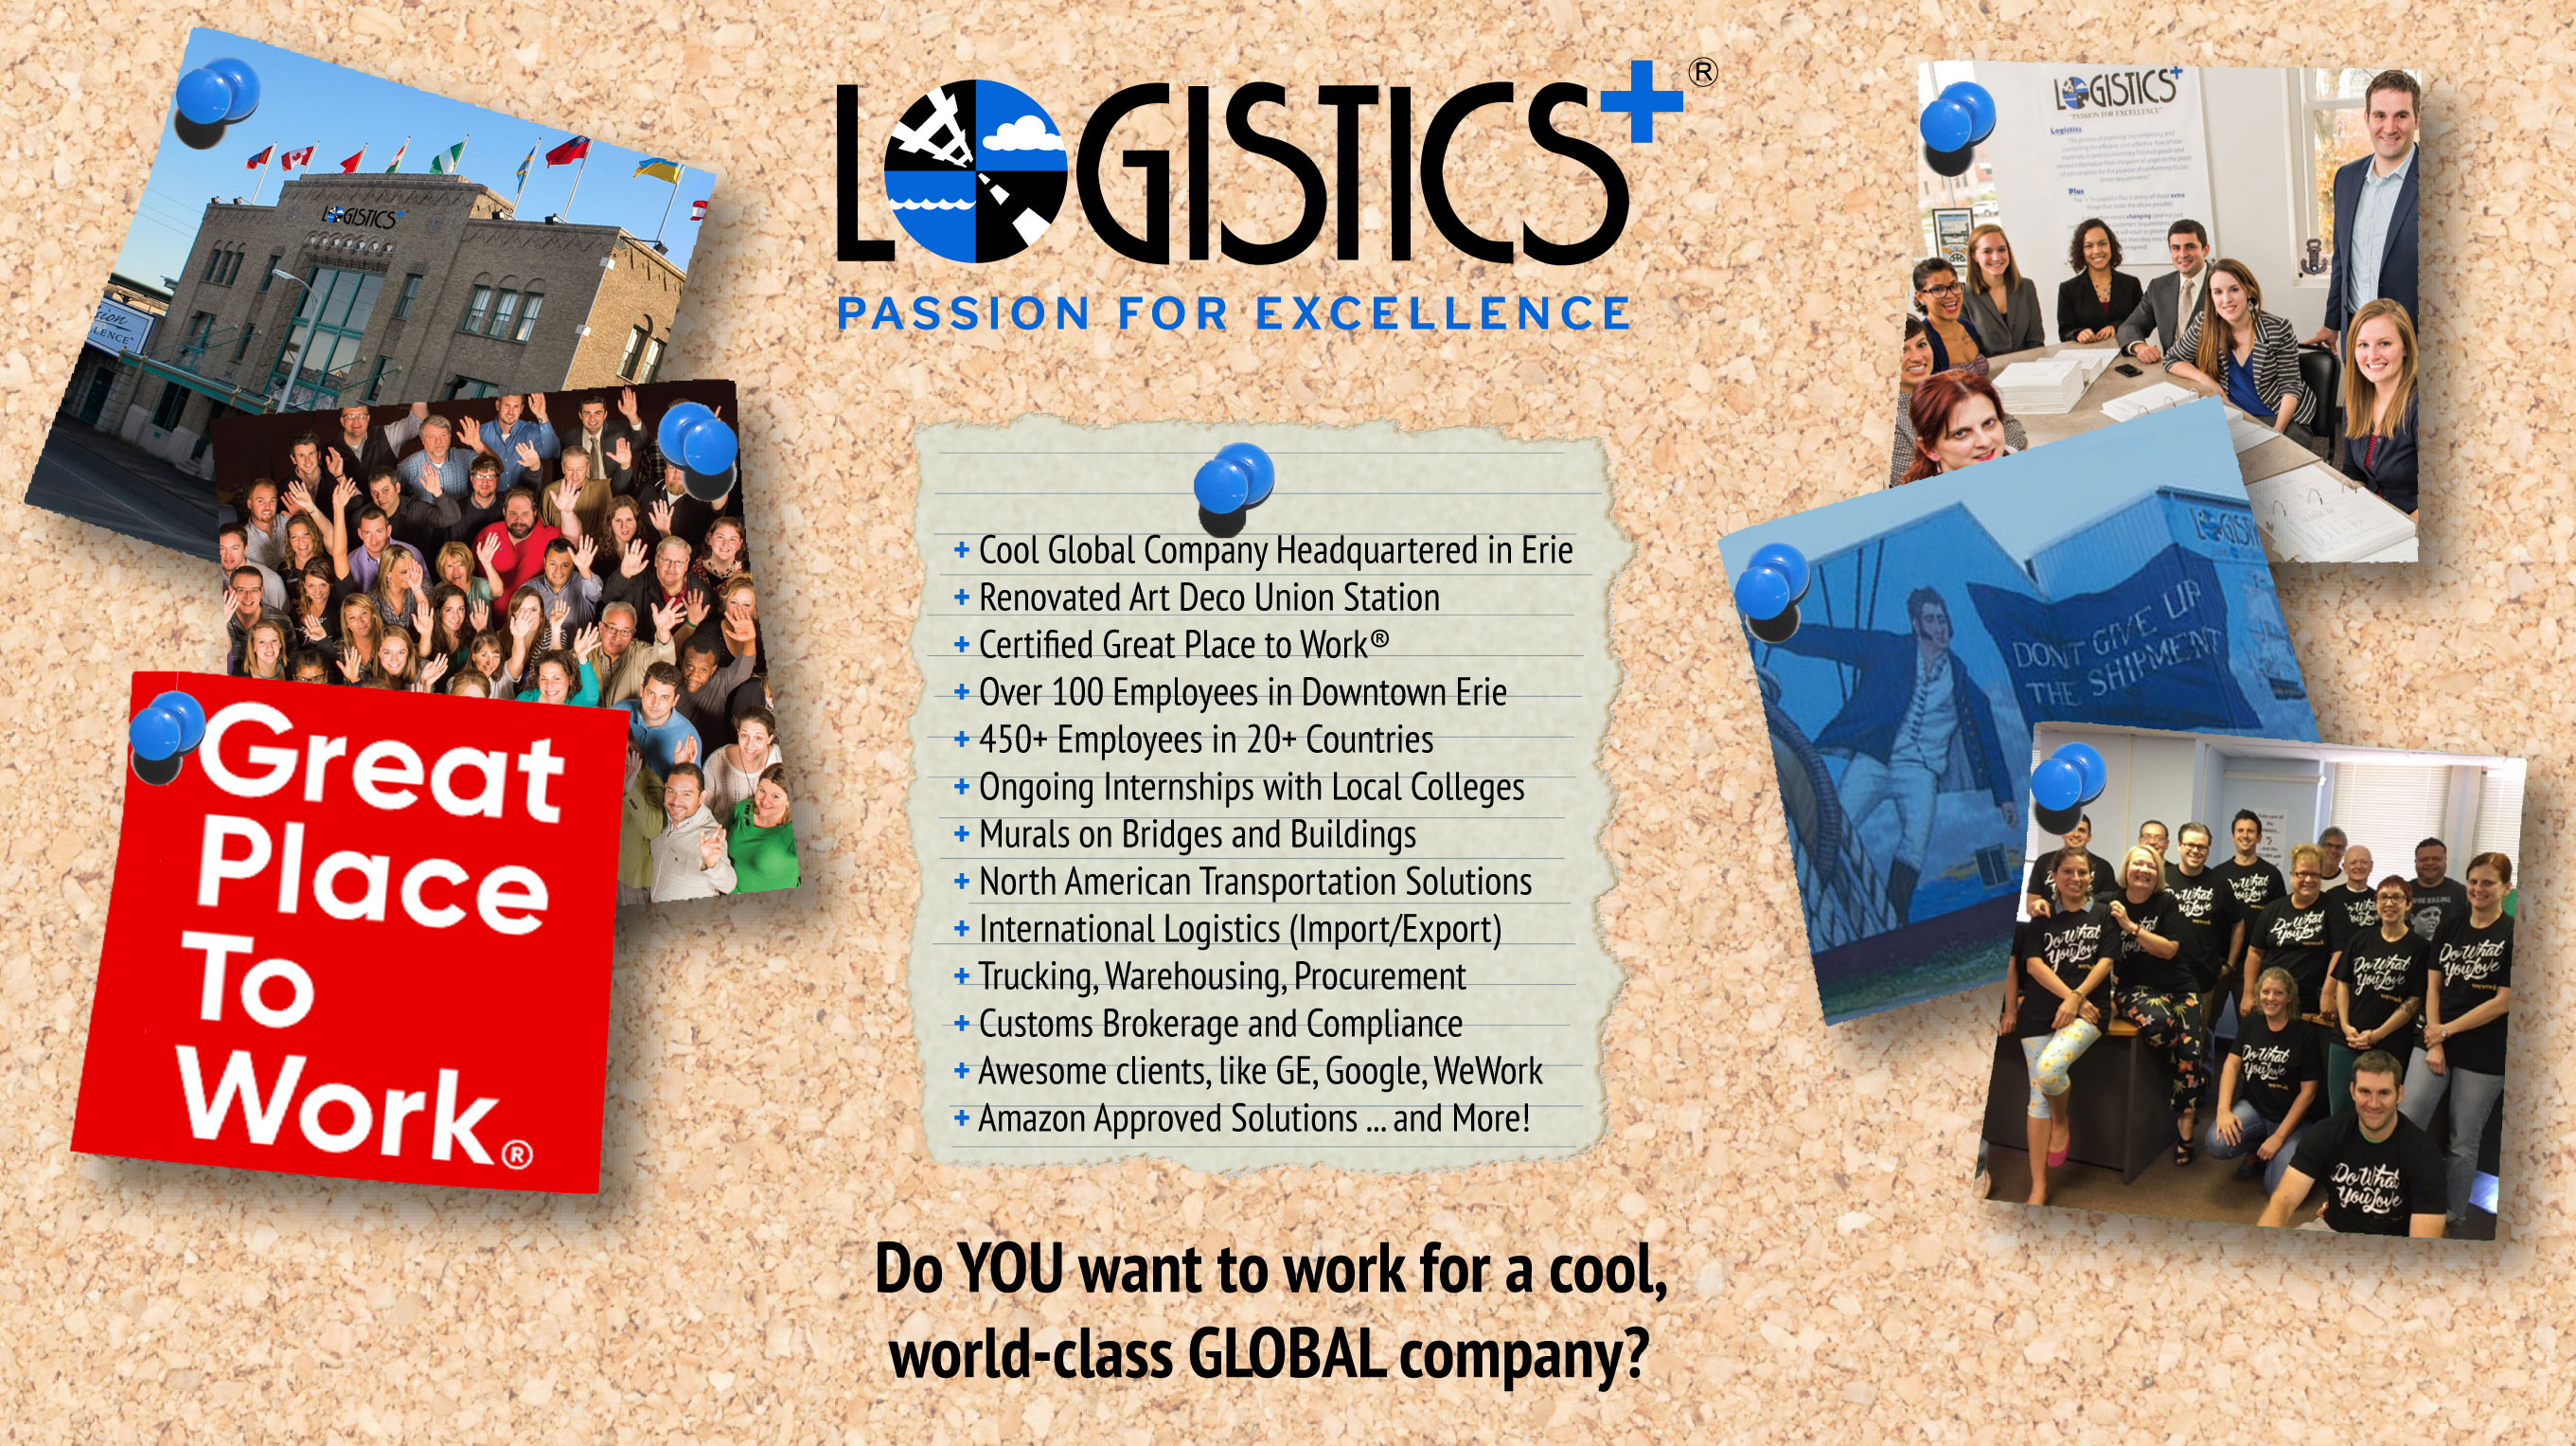 Ready for a fun career in logistics? - Logistics Plus